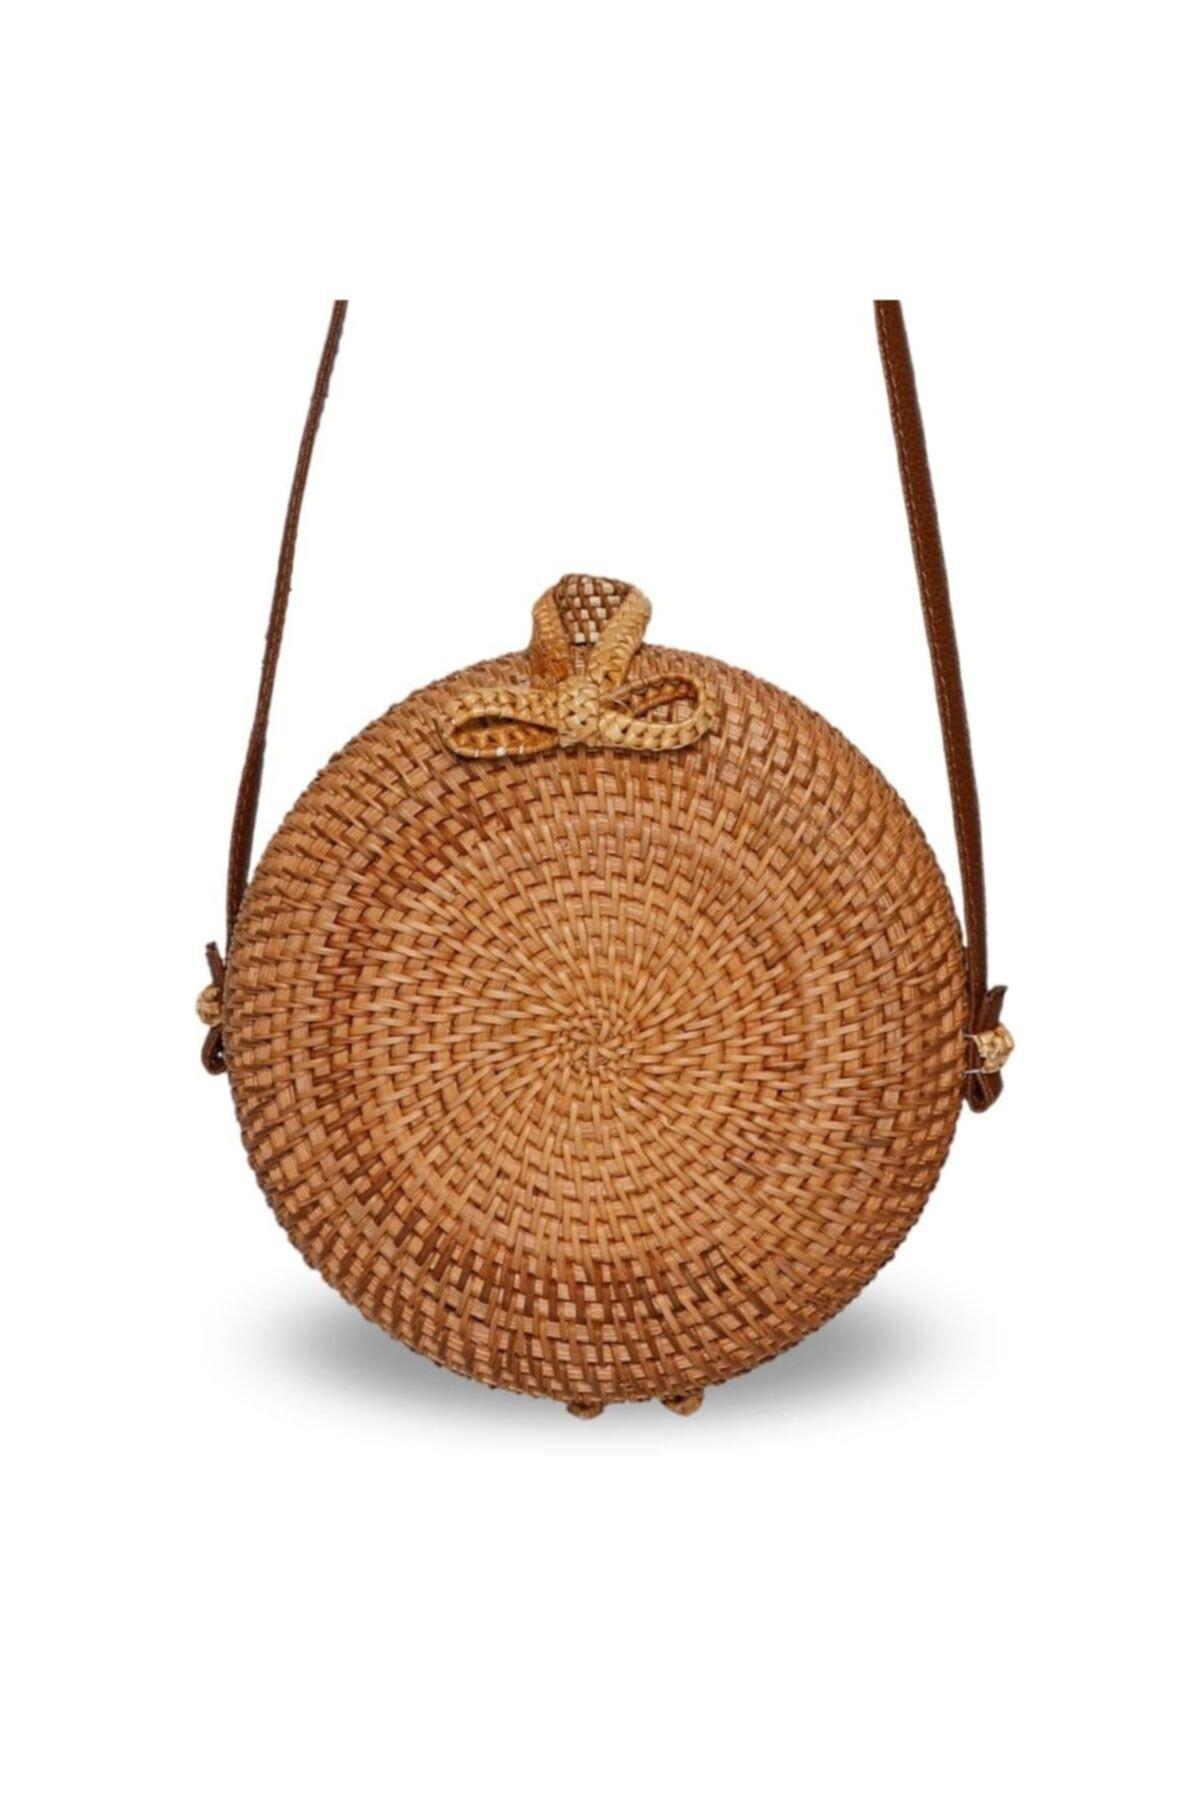 The All Brands Kadın Kahverengi Bagoist Tam Oval Rattan Çanta 20 cm 1